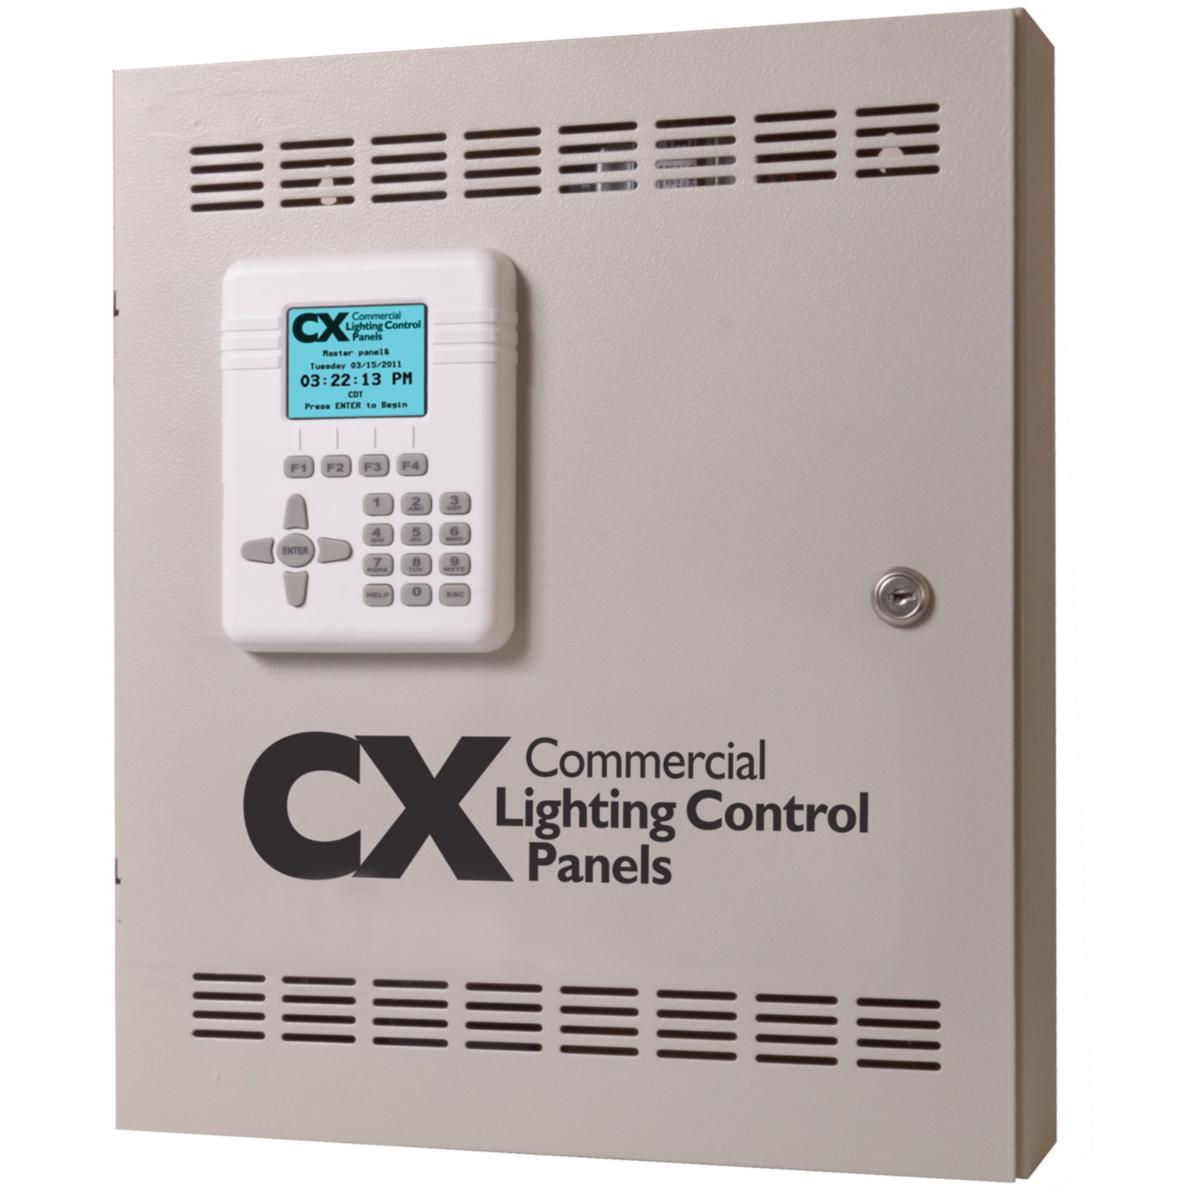 hight resolution of cx162s162nm hba lighting control panel w 16ea 20a 1p elec held relays nema 1 surface